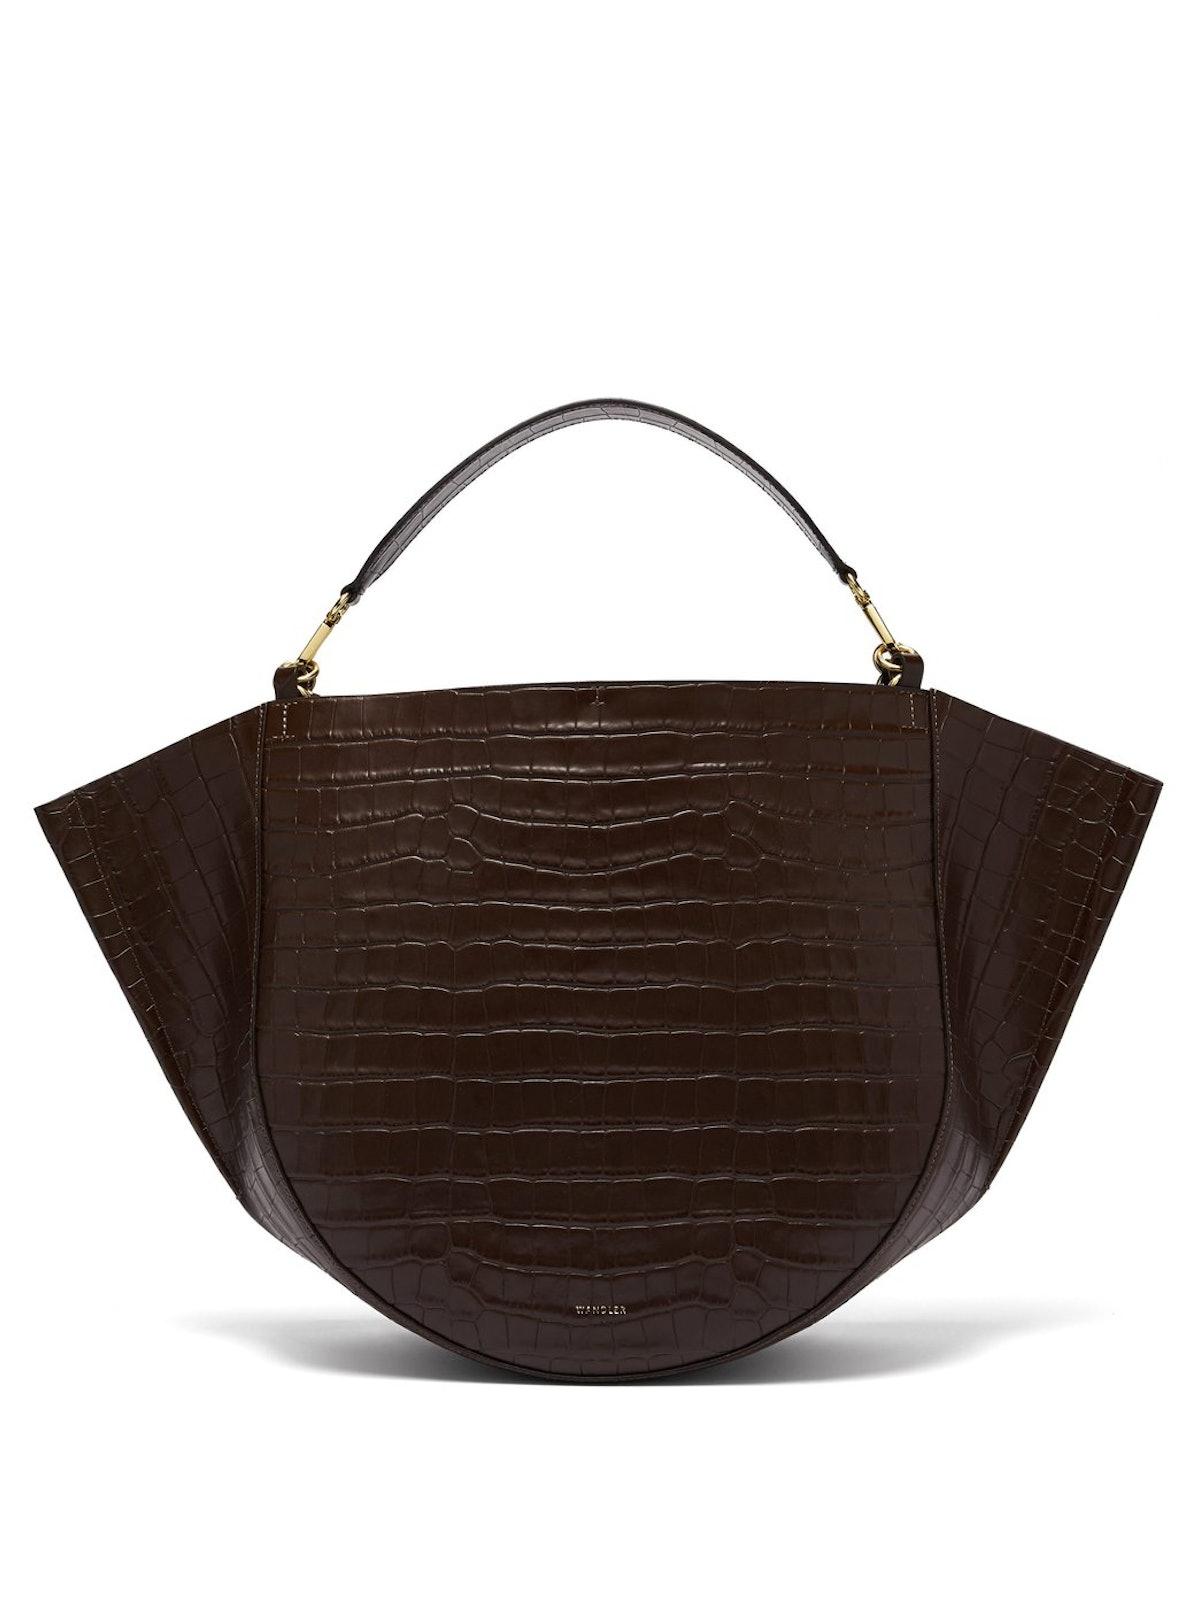 Mia Crocodile-Effect Leather Tote Bag